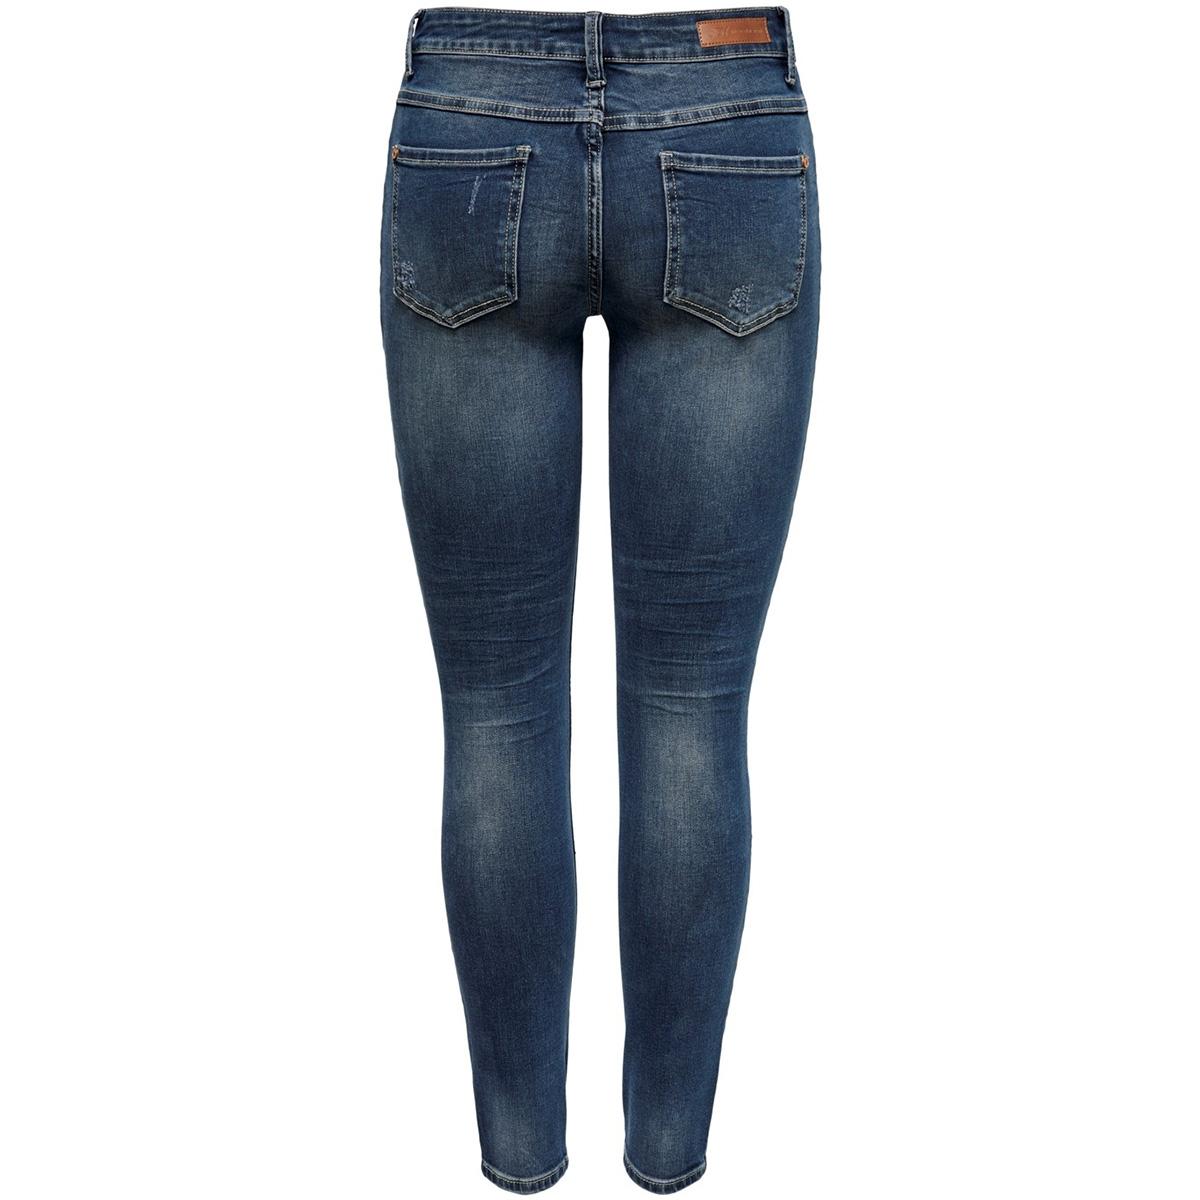 jdycarola life rg skn supstr mb dnm 15182653 jacqueline de yong jeans medium blue denim